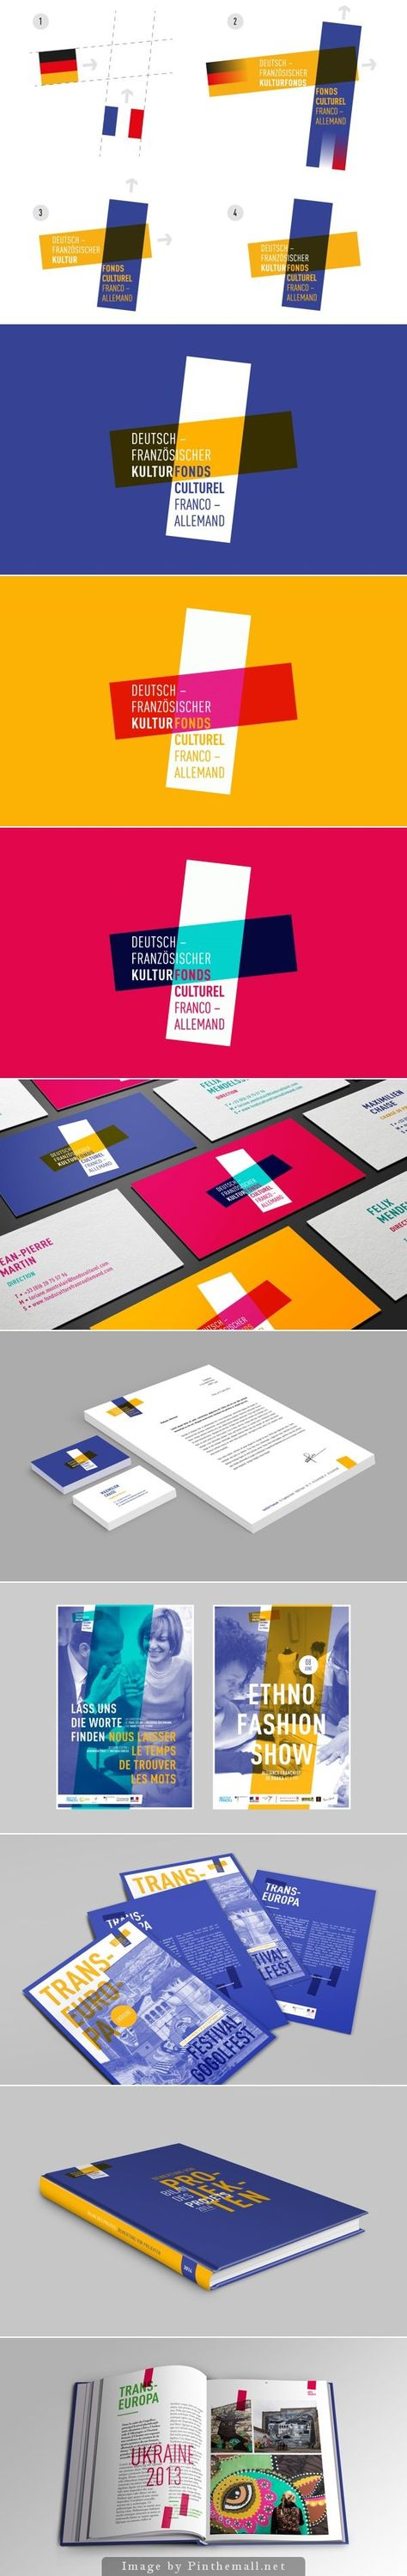 190 Design Branding Ideas Branding Design Branding Design